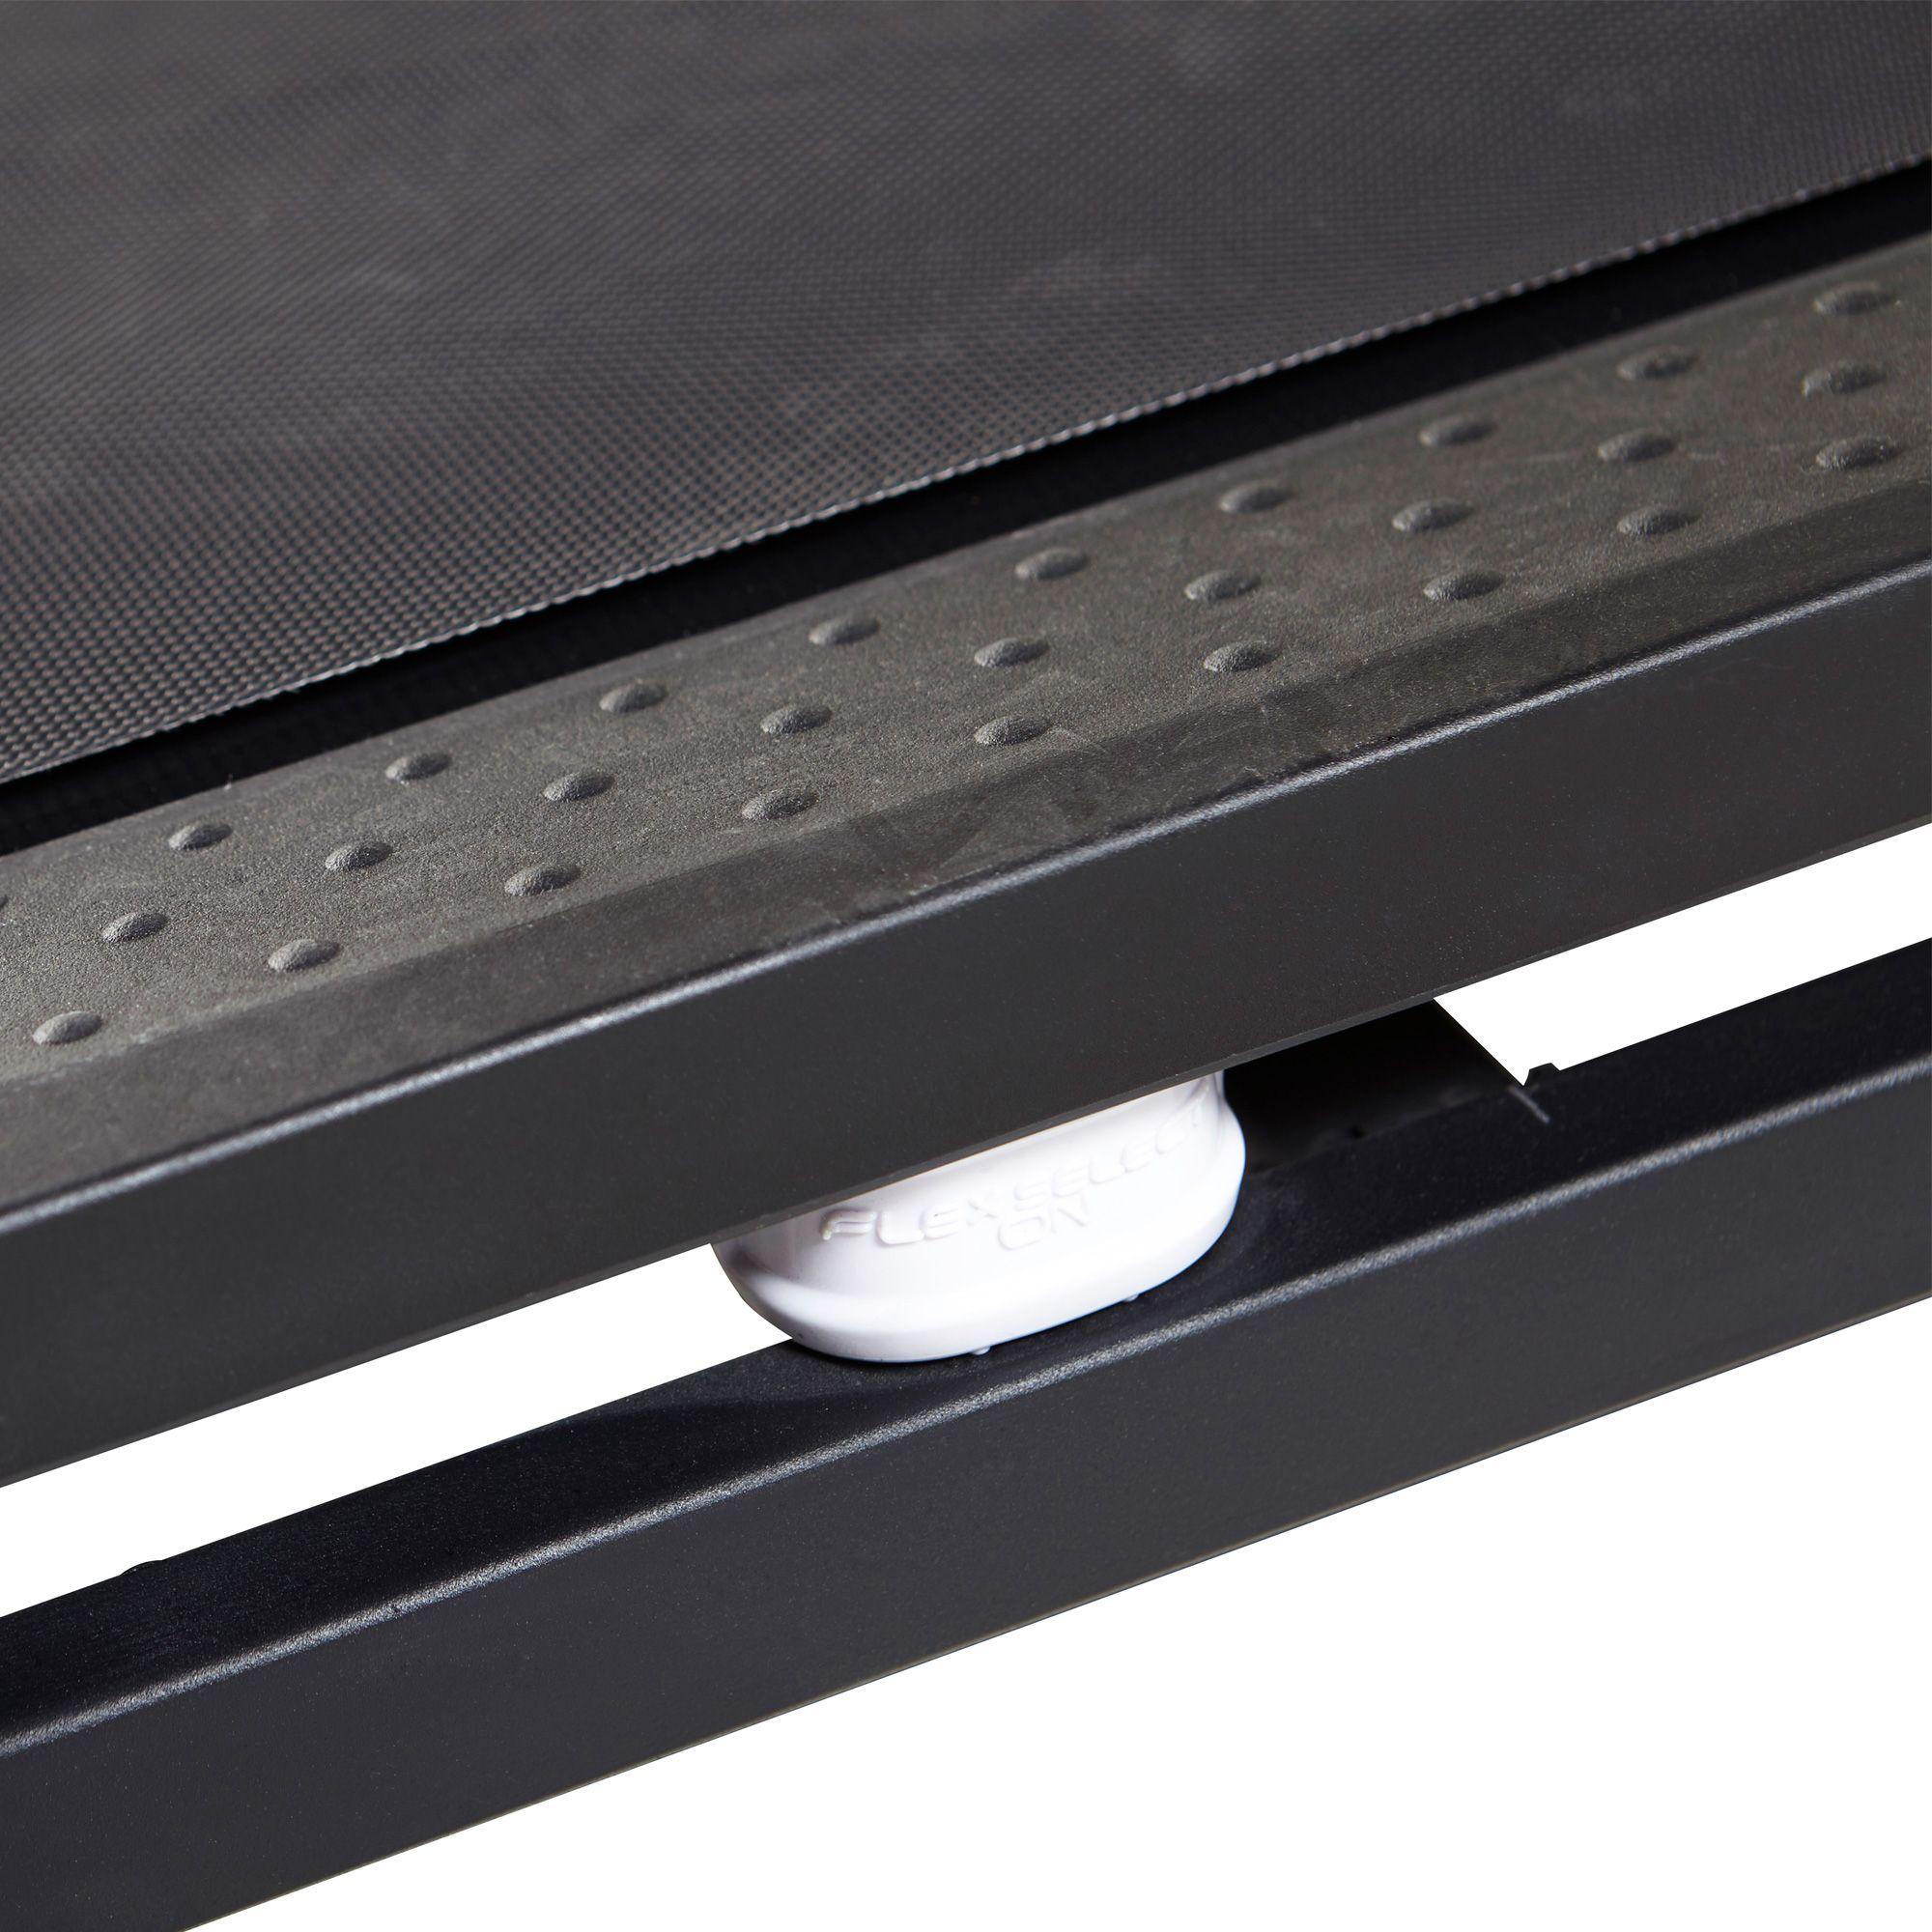 Worn Treadmill Deck: NordicTrack T10.0 Treadmill